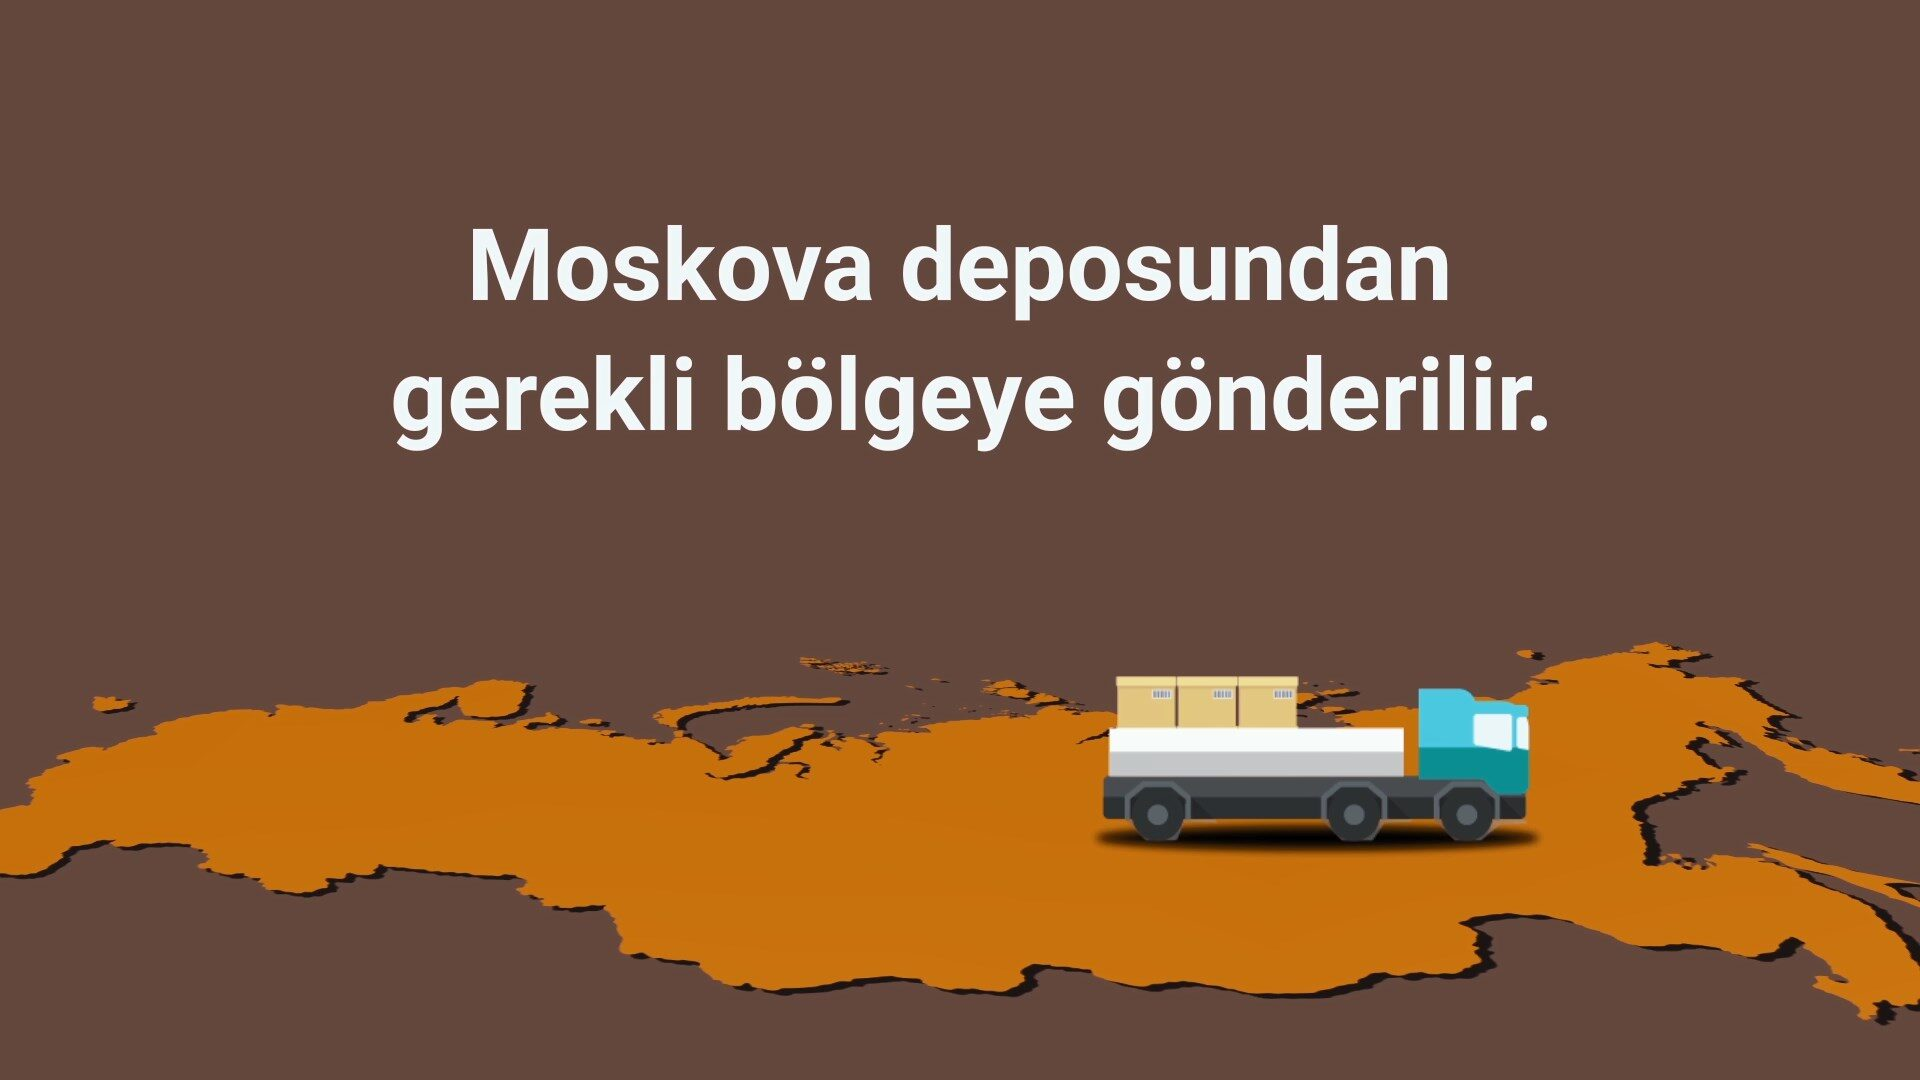 TürkTicaretMerkezi4.mp4 snapshot 02.44.960 1920x1080 -